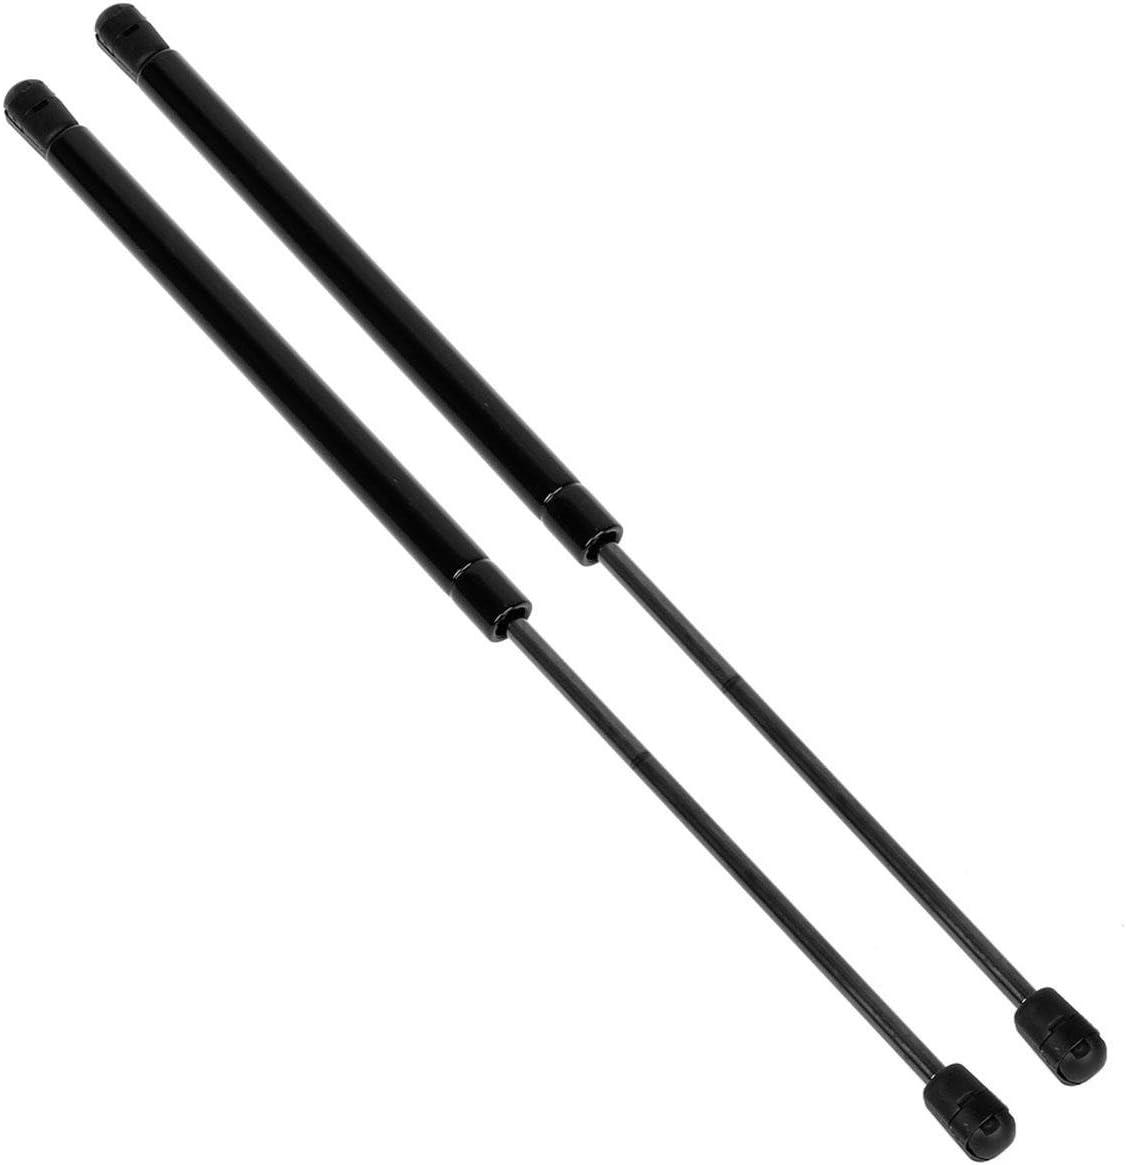 Maxpow Compatible With C1620651 SE187P40S10 18.7 40Lbs Per prop 10mm Ball Socket Struts Lift Supports Damper Props Rods